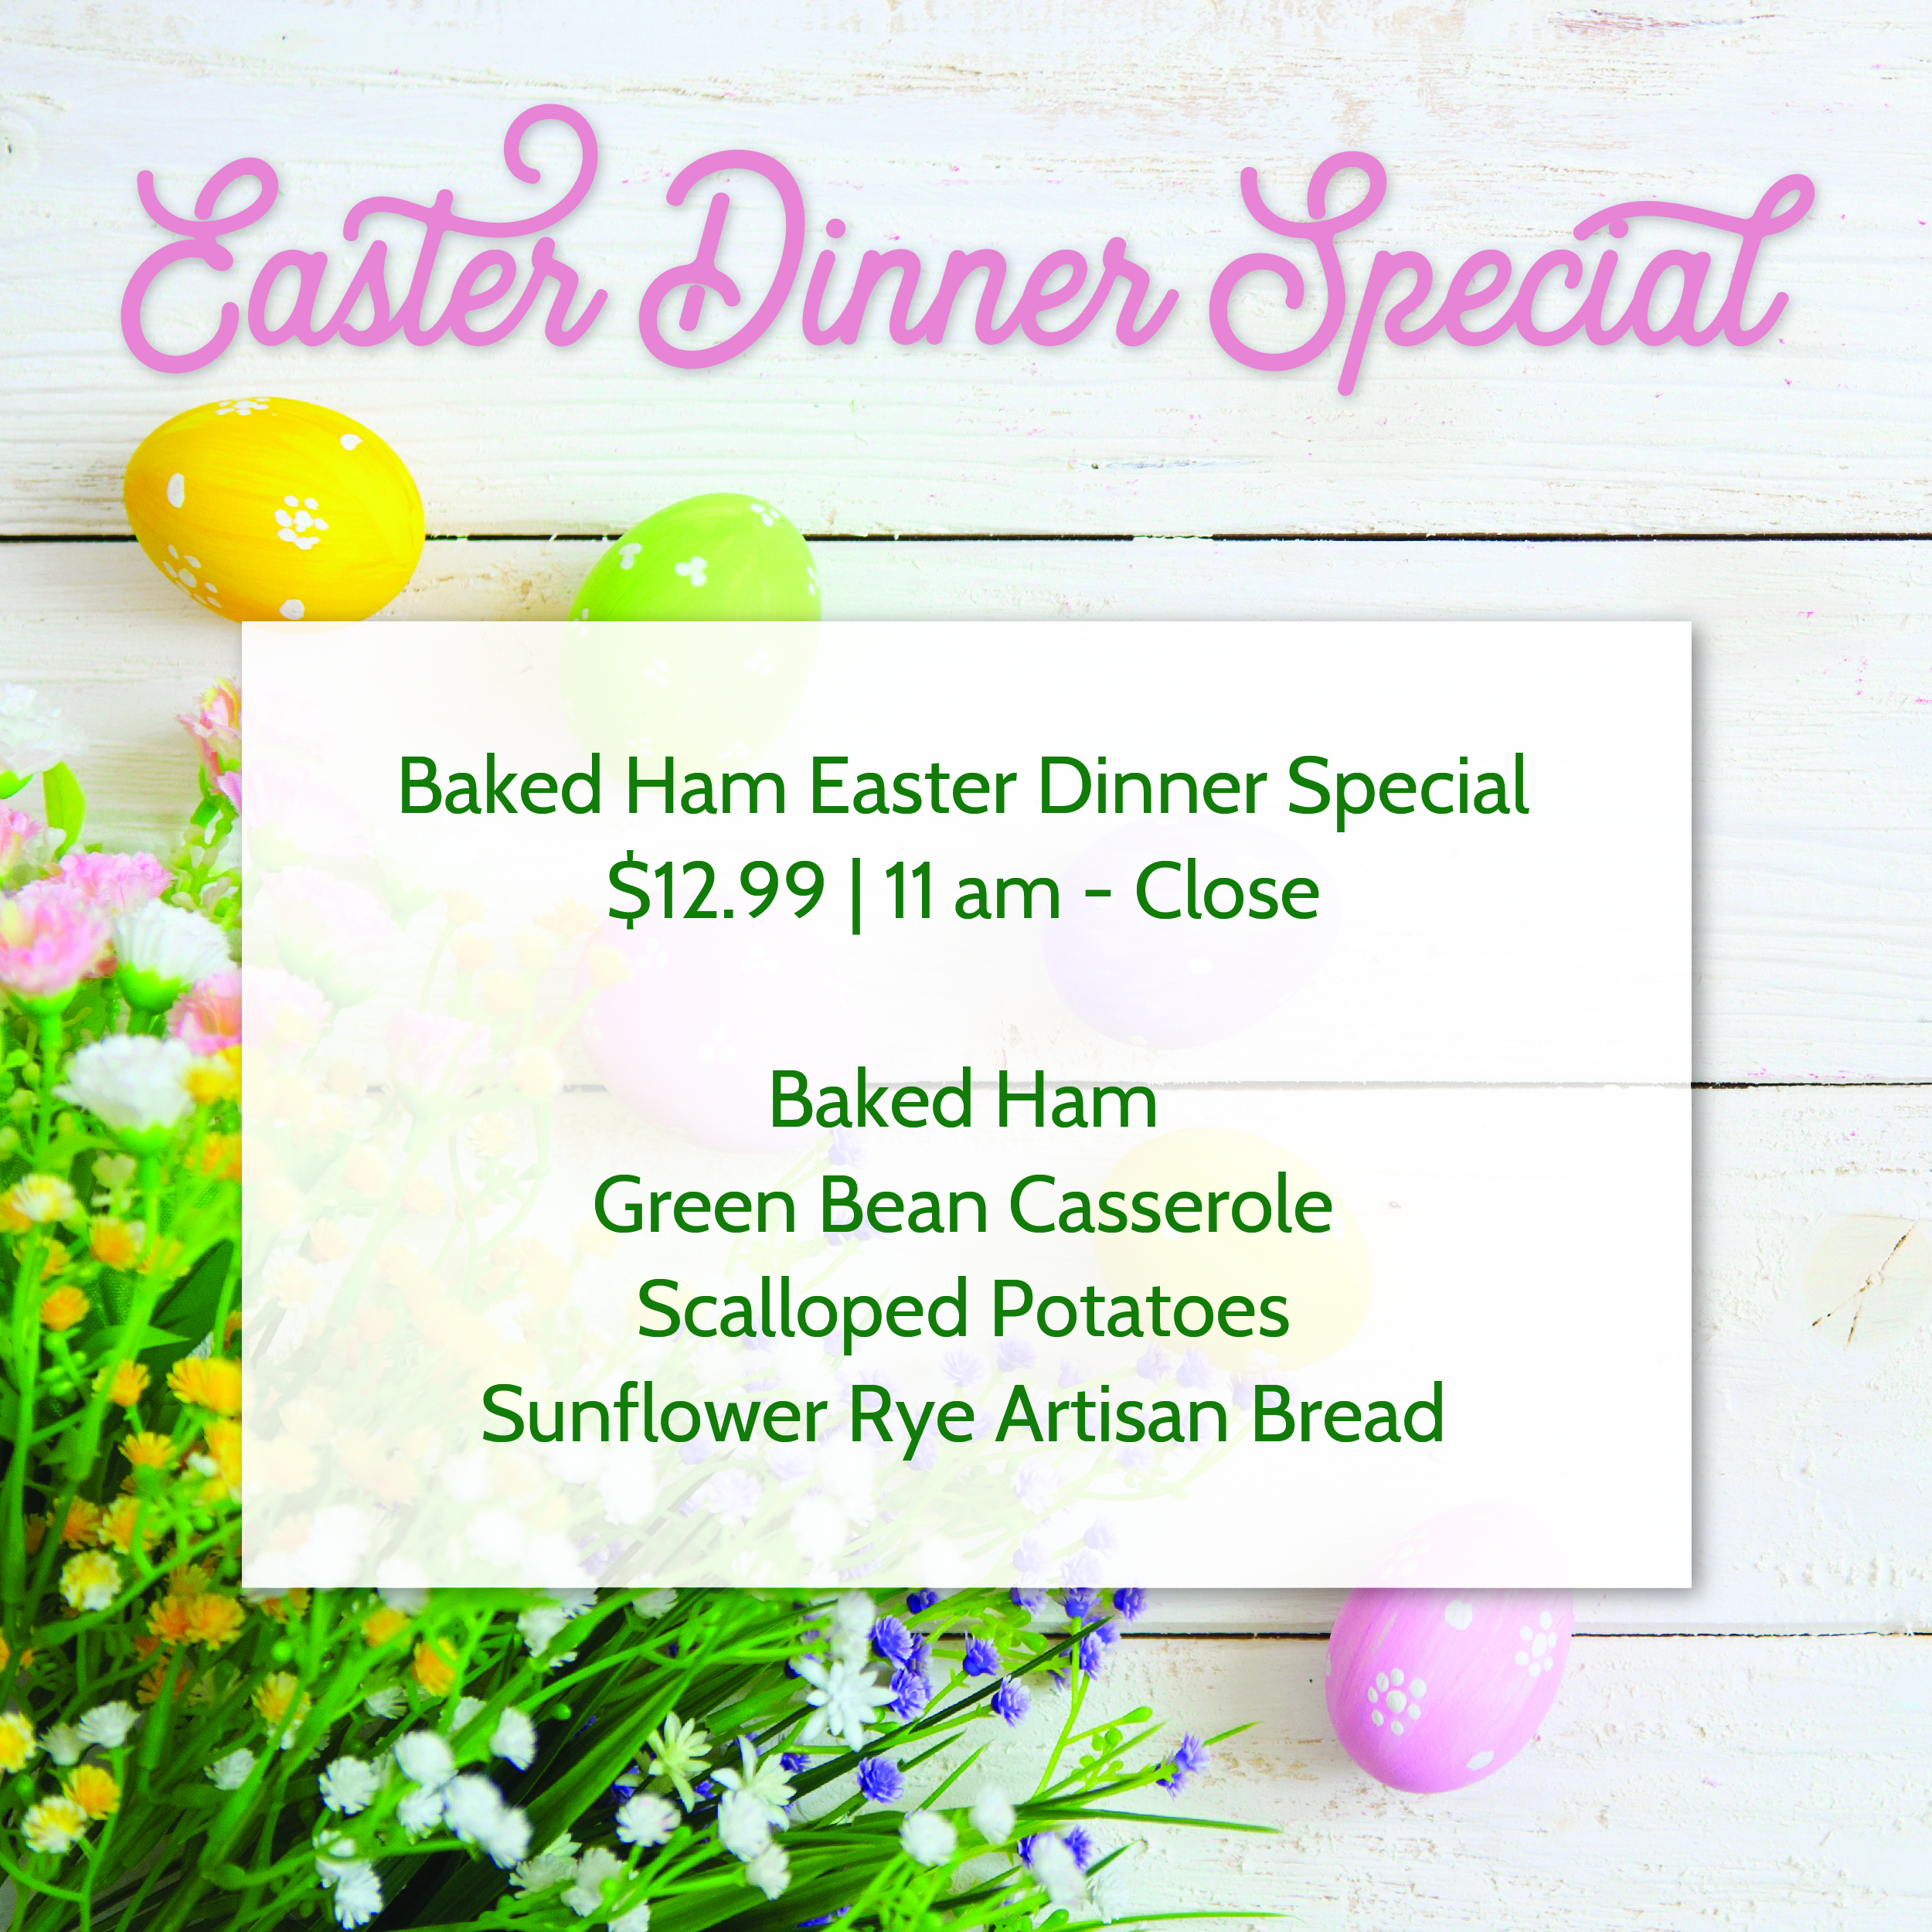 Easter Dinner Special